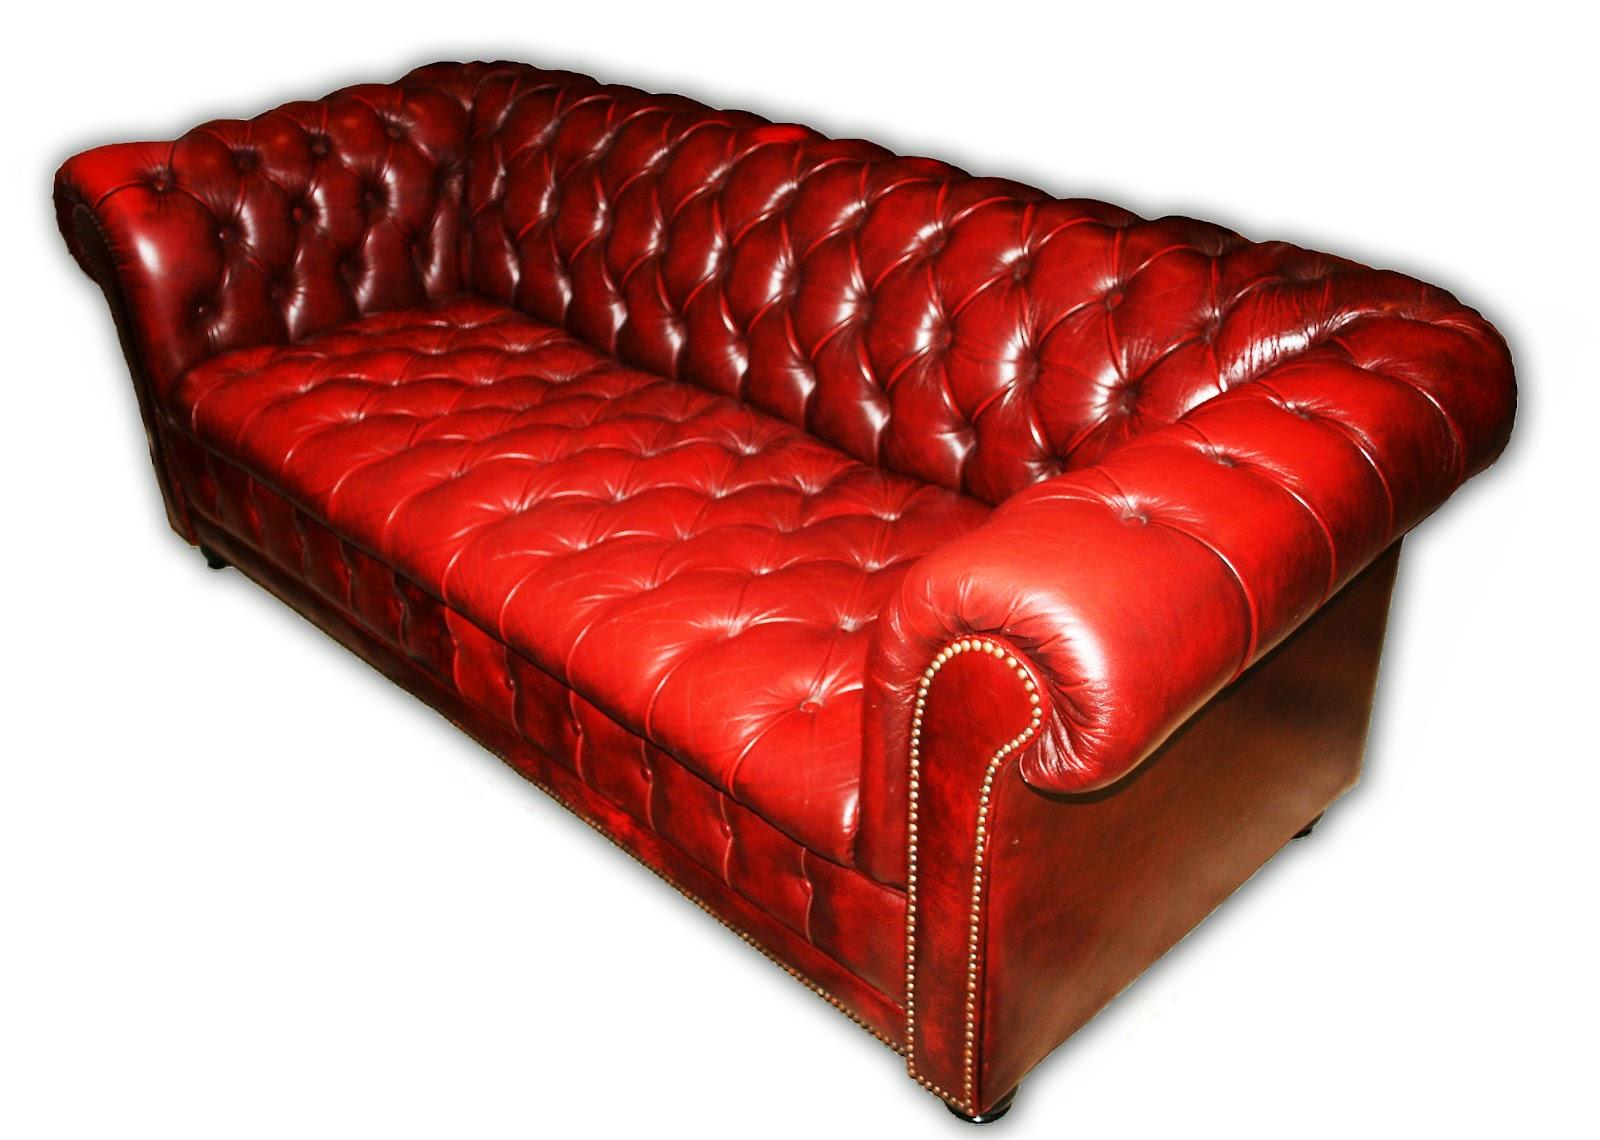 apartmentf15: chesterfield sofa